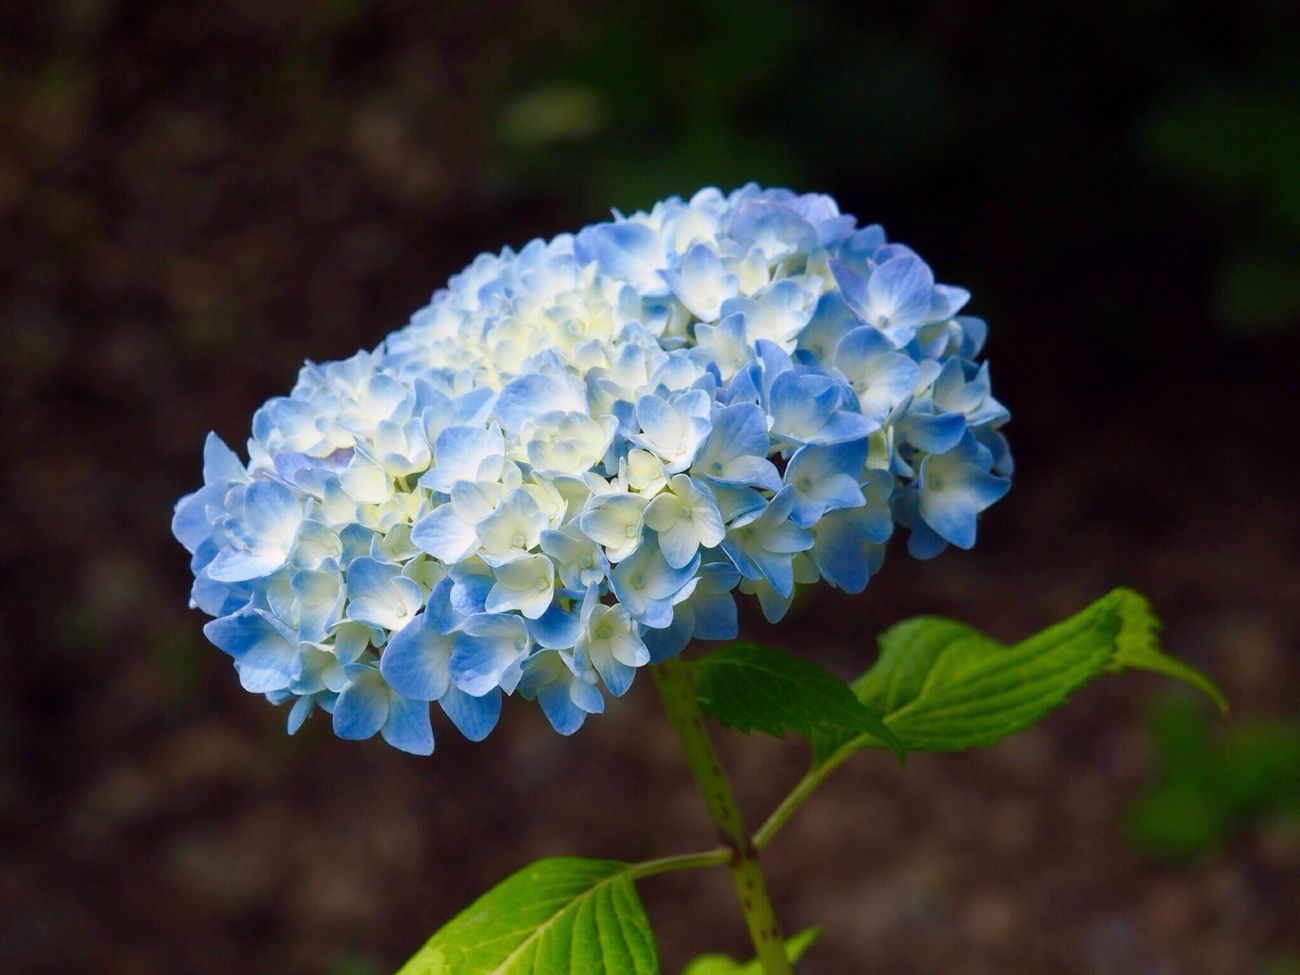 Kyoto Japan Uji Mimurotoji Hydrangea Flower Growth Beauty In Nature Nature Plant Close-up Day Outdoors Blue No People Olympus PEN-F 京都 日本 宇治 三室戸寺 紫陽花 10,000株の紫陽花